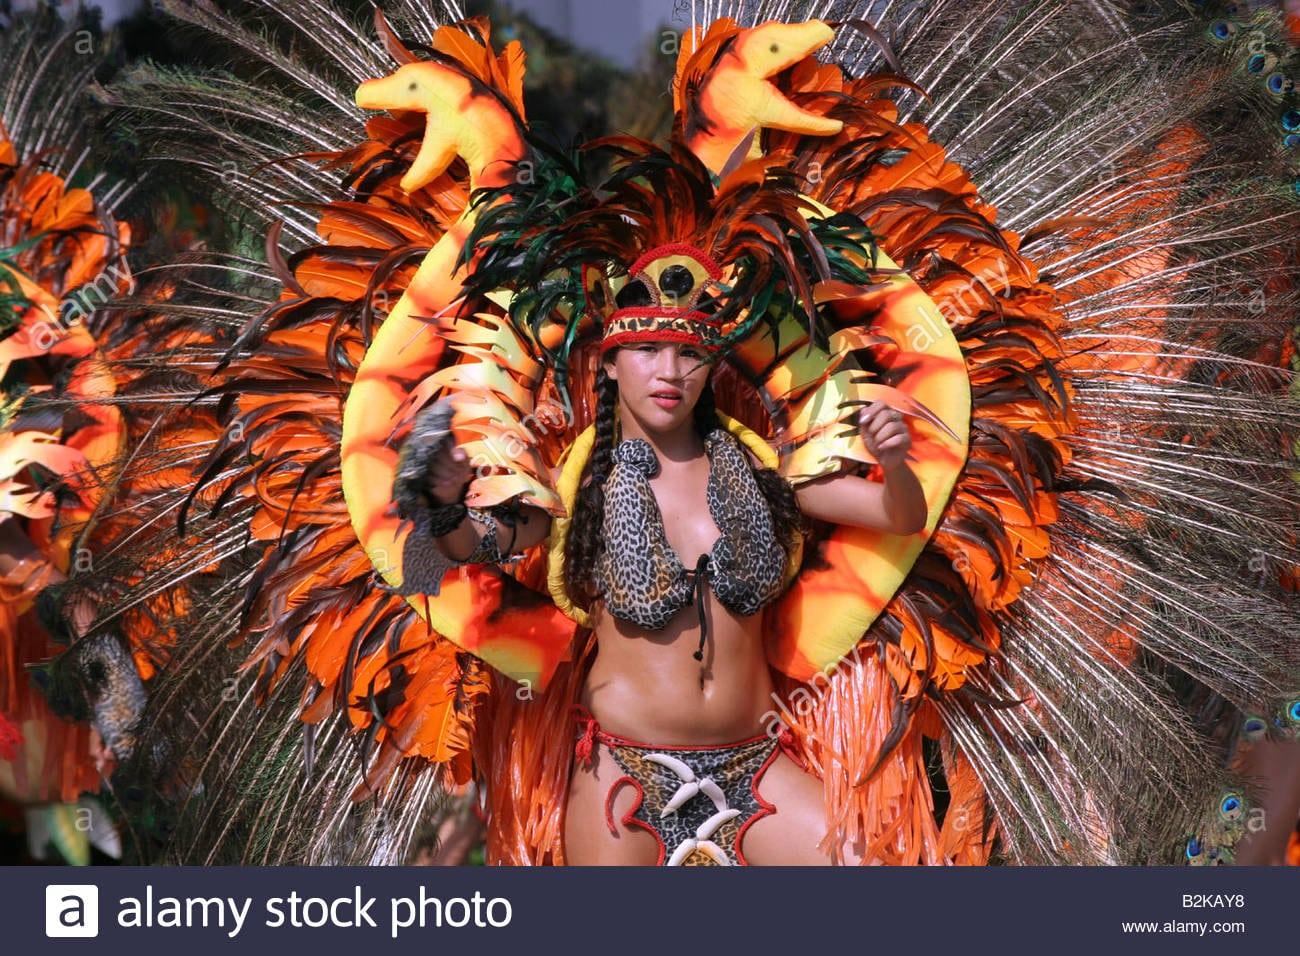 Brazil Dance Dancer At The Boi Bumba Show Parintins Carnival